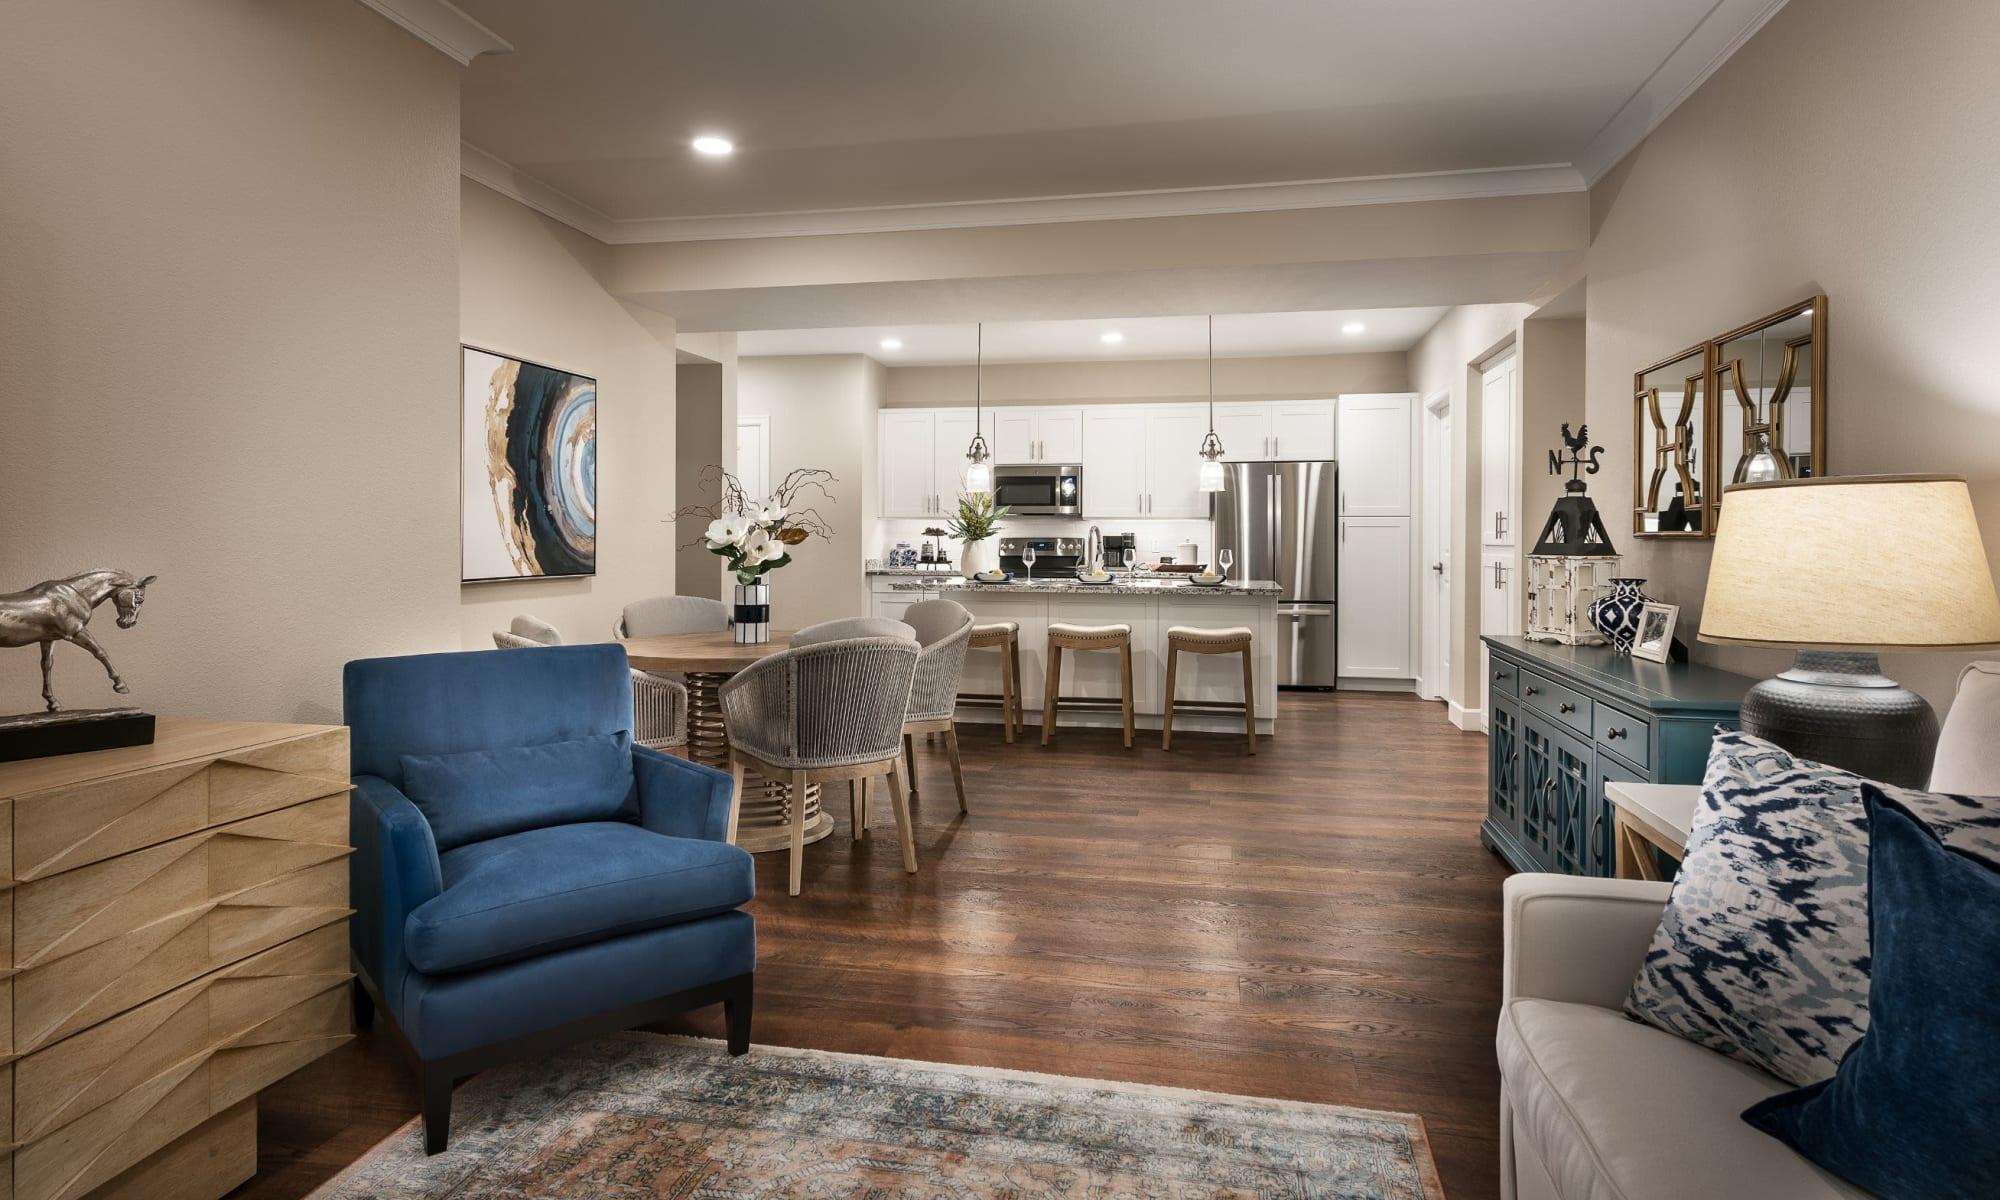 Apartments at San Artes in Scottsdale, Arizona